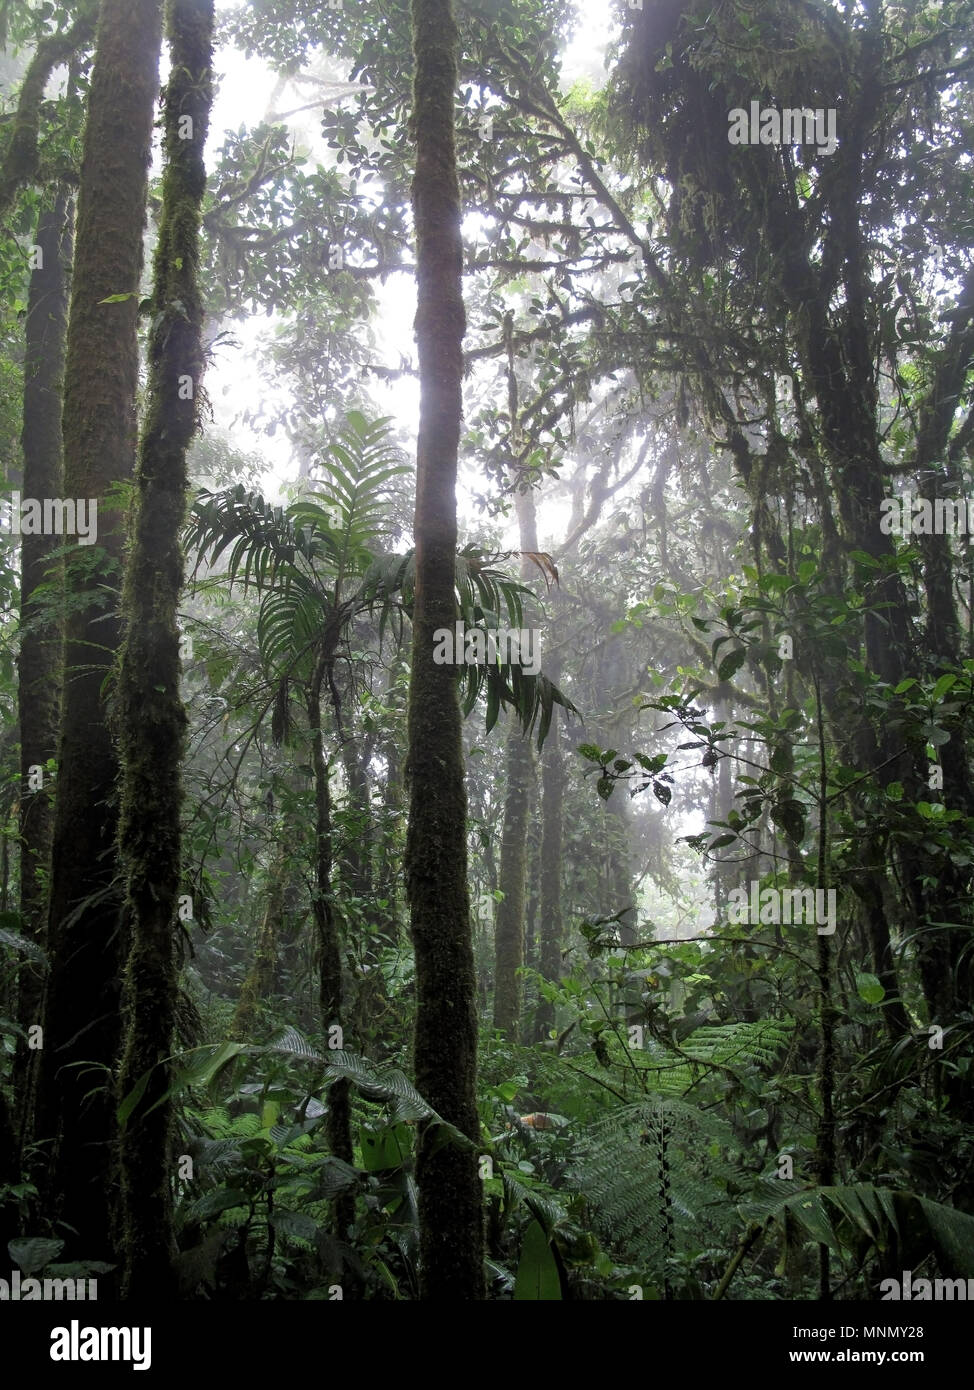 Cloud forest of Reserva Biologica Bosque Nuboso Monteverde, Costa Rica - Stock Image